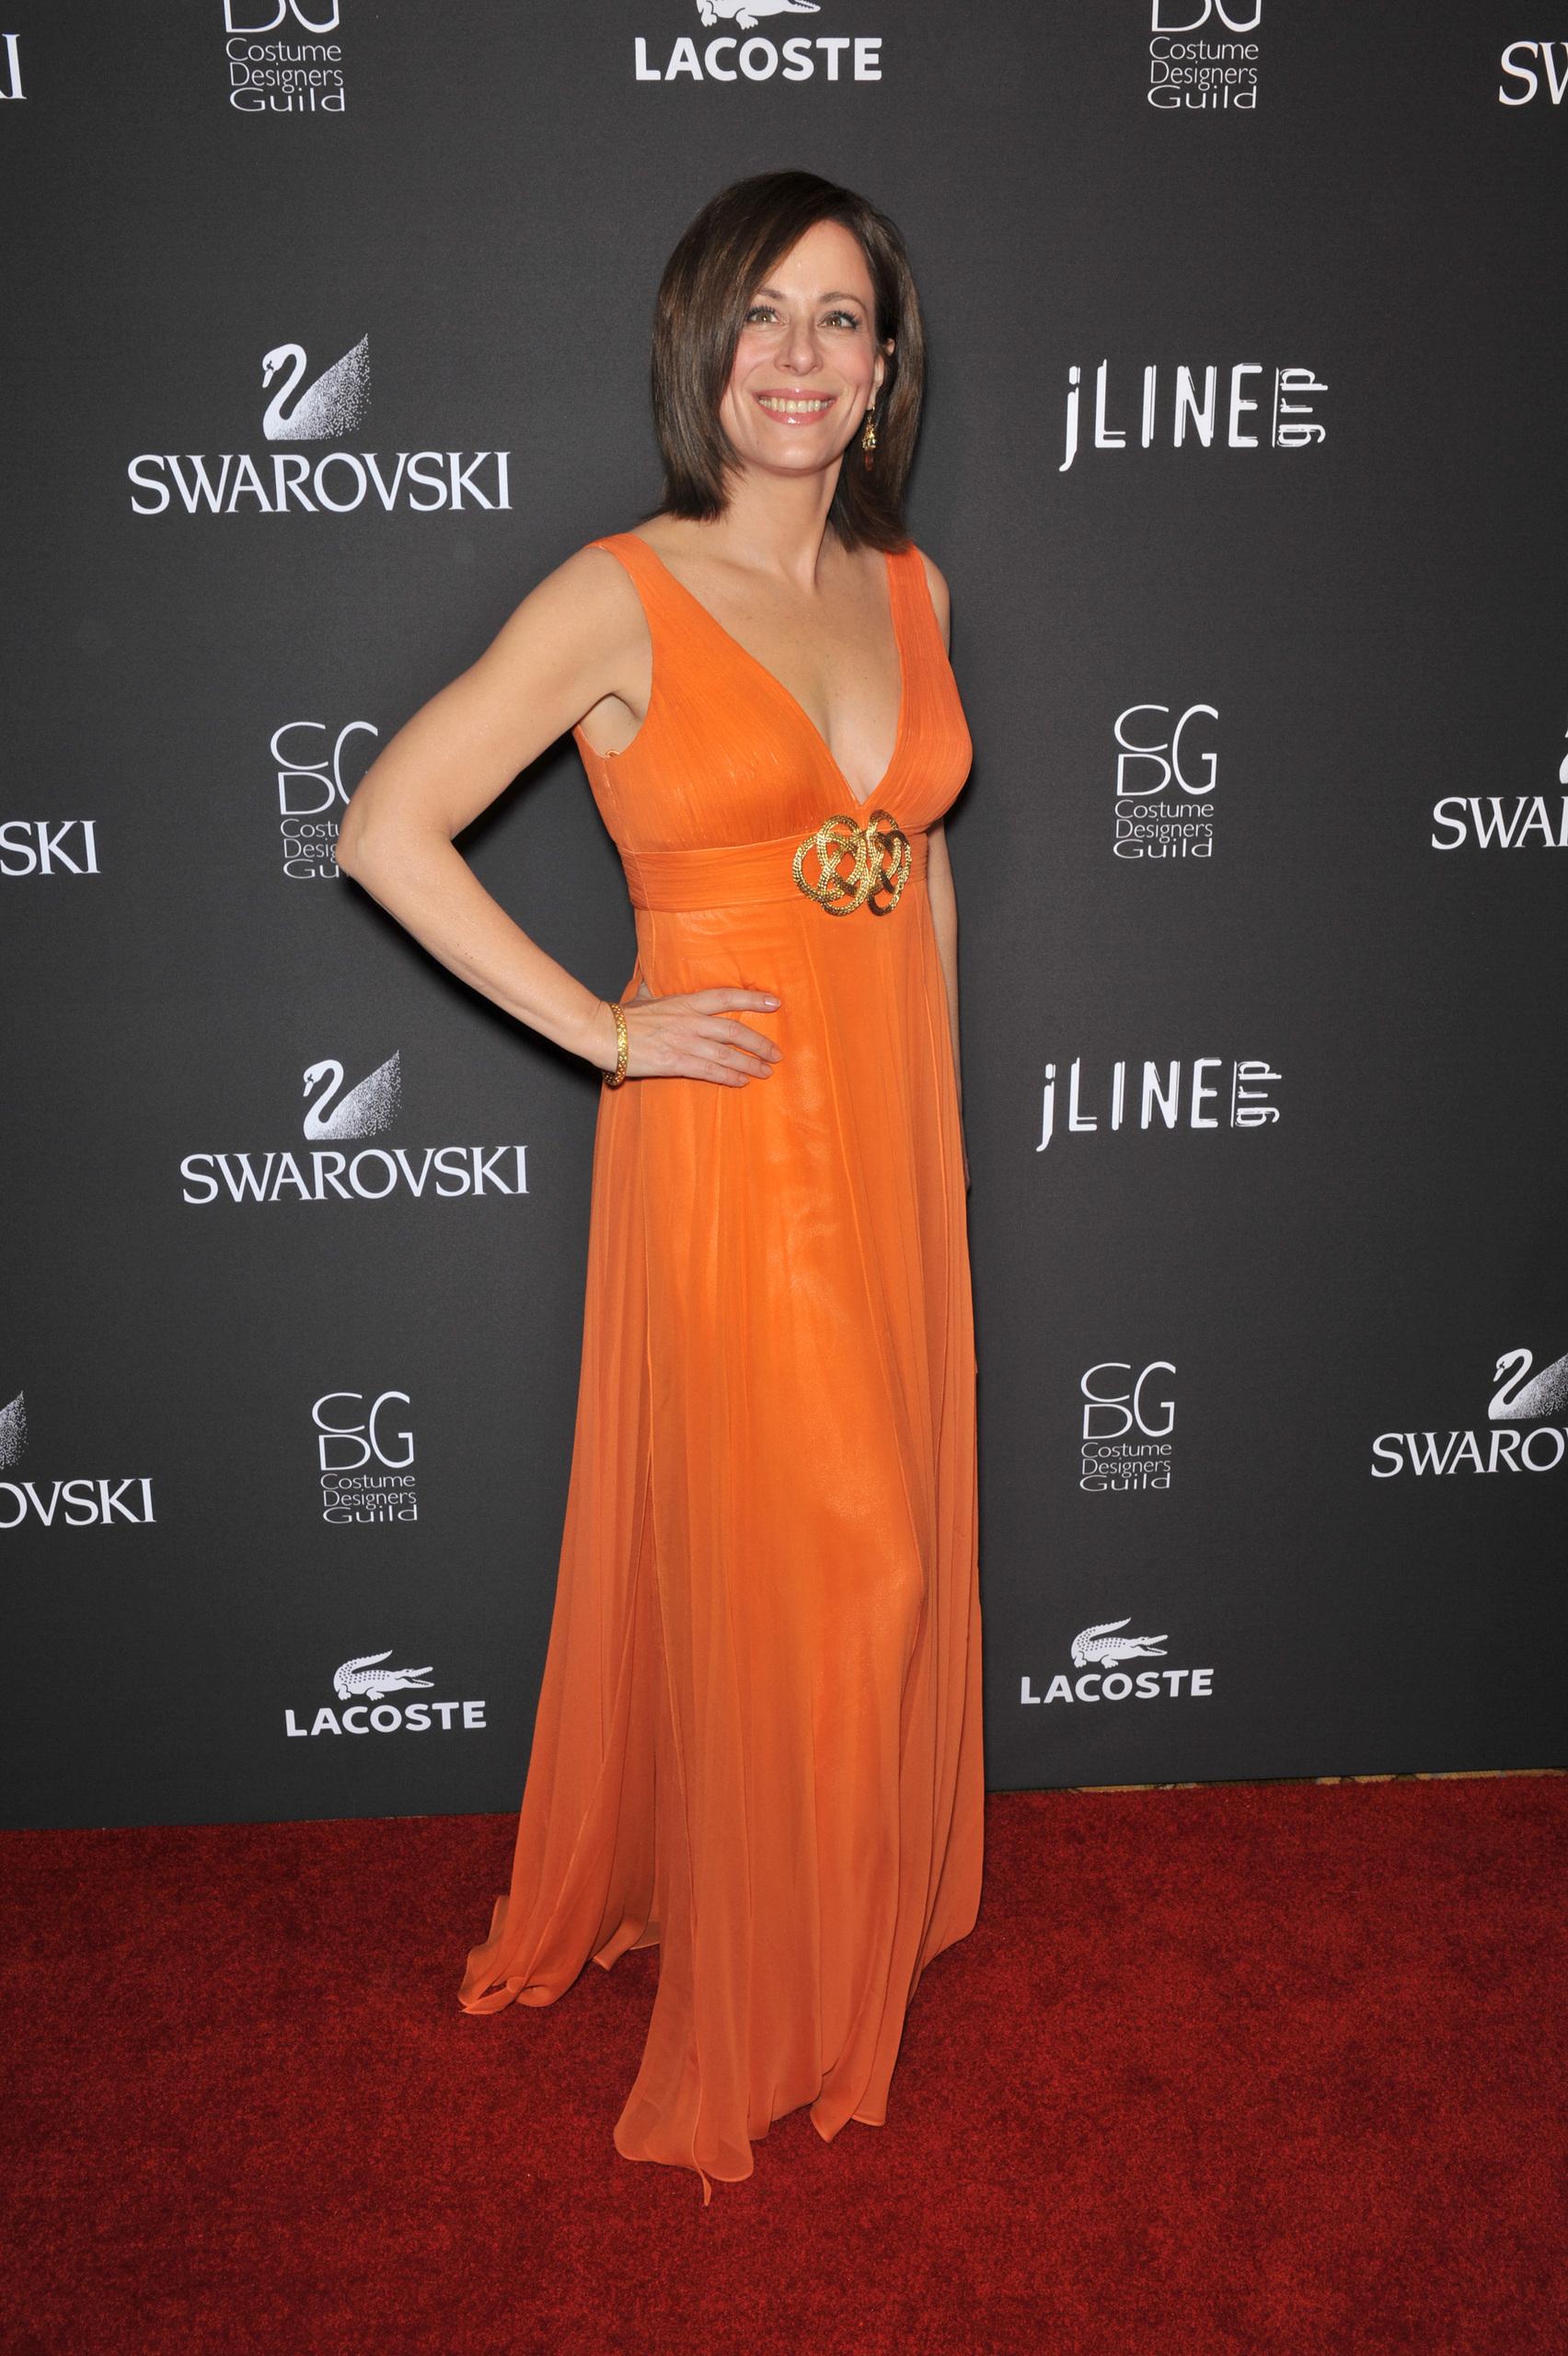 Jane Kaczmarek - 11th Annual Costume Designers Guild